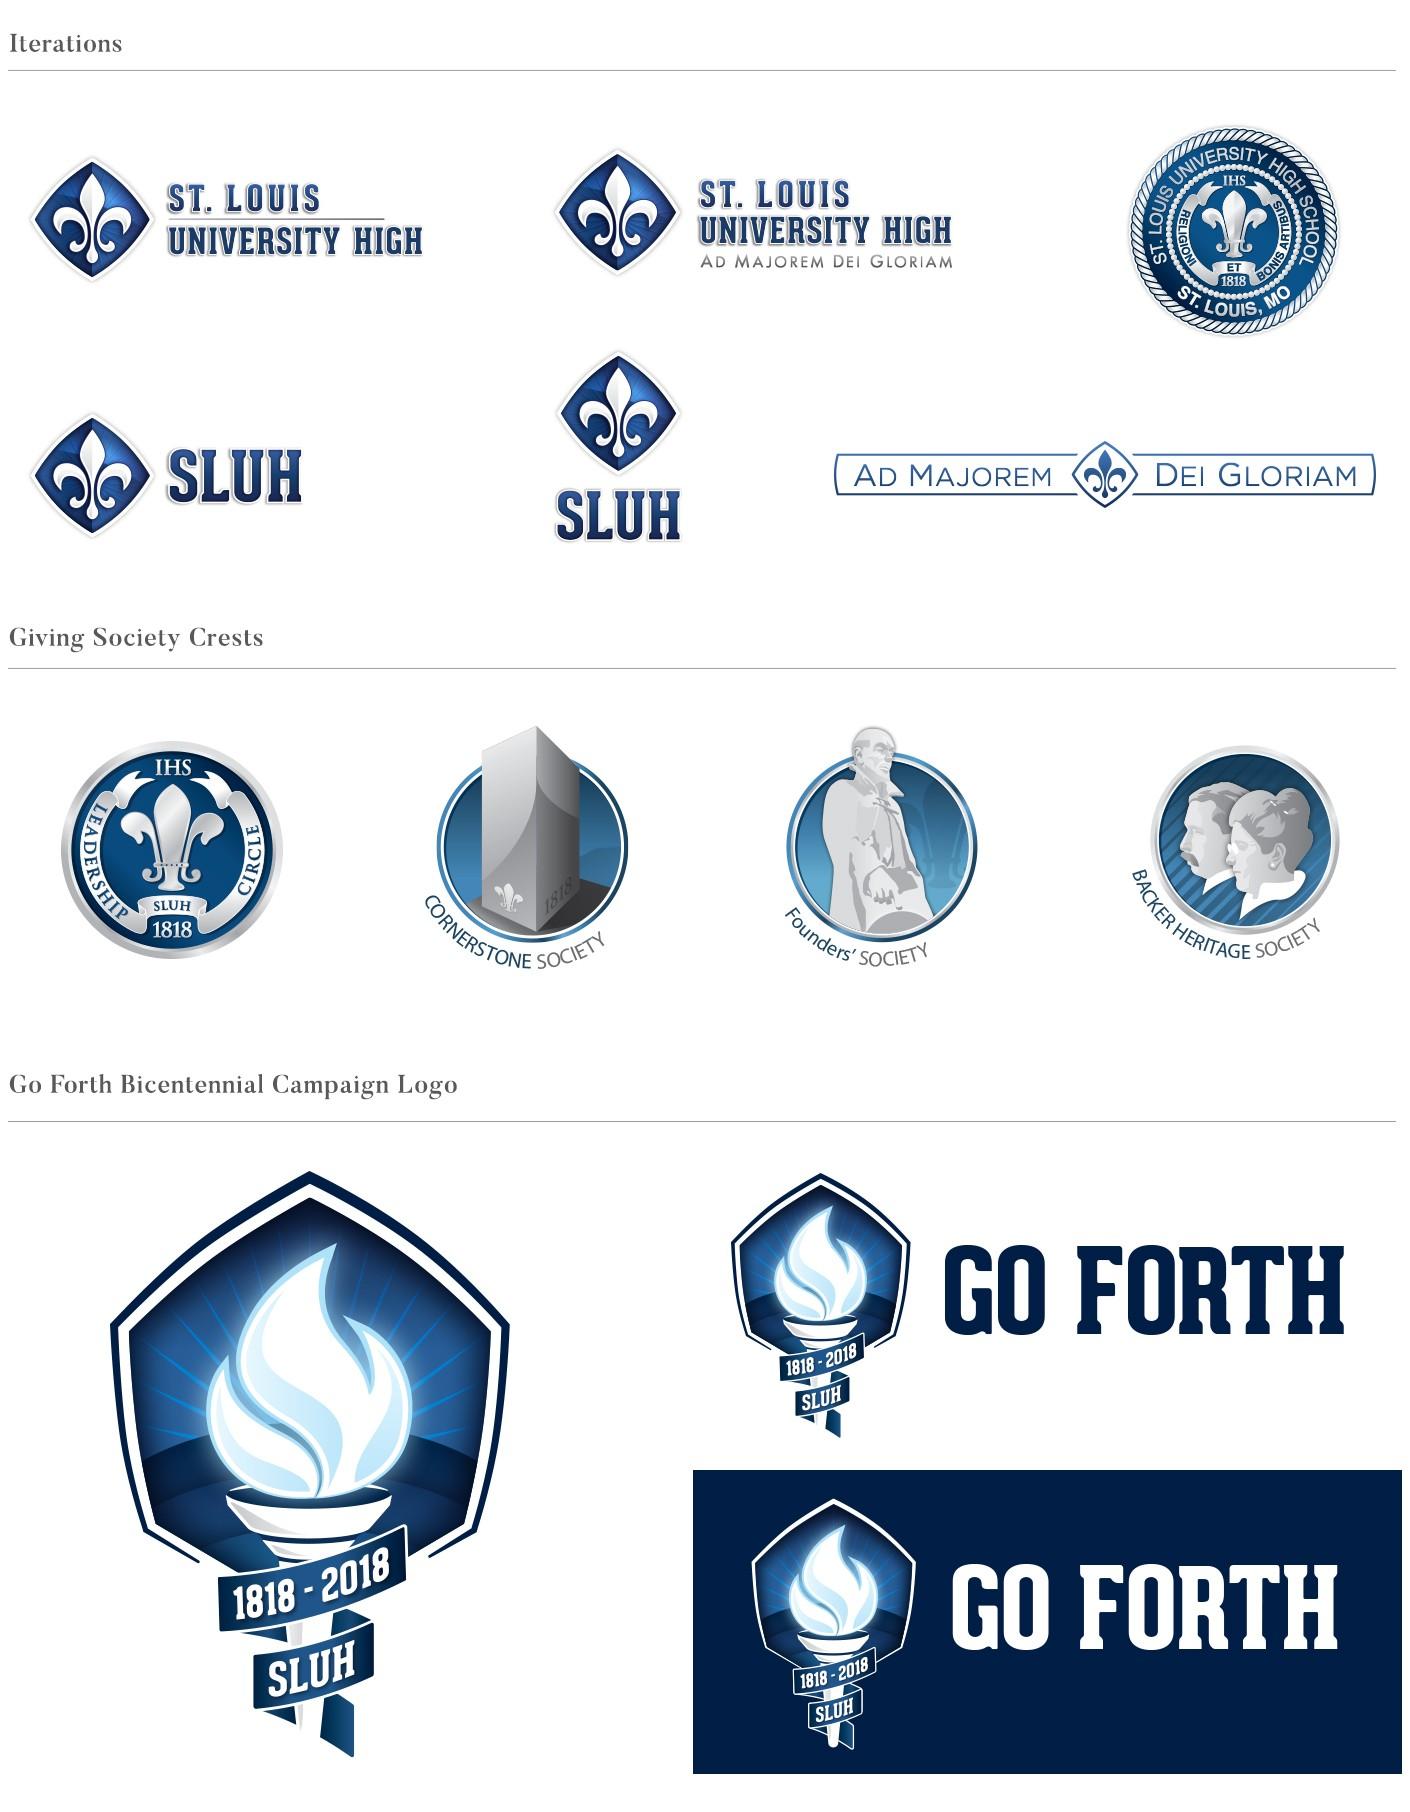 sluh branding and logo design